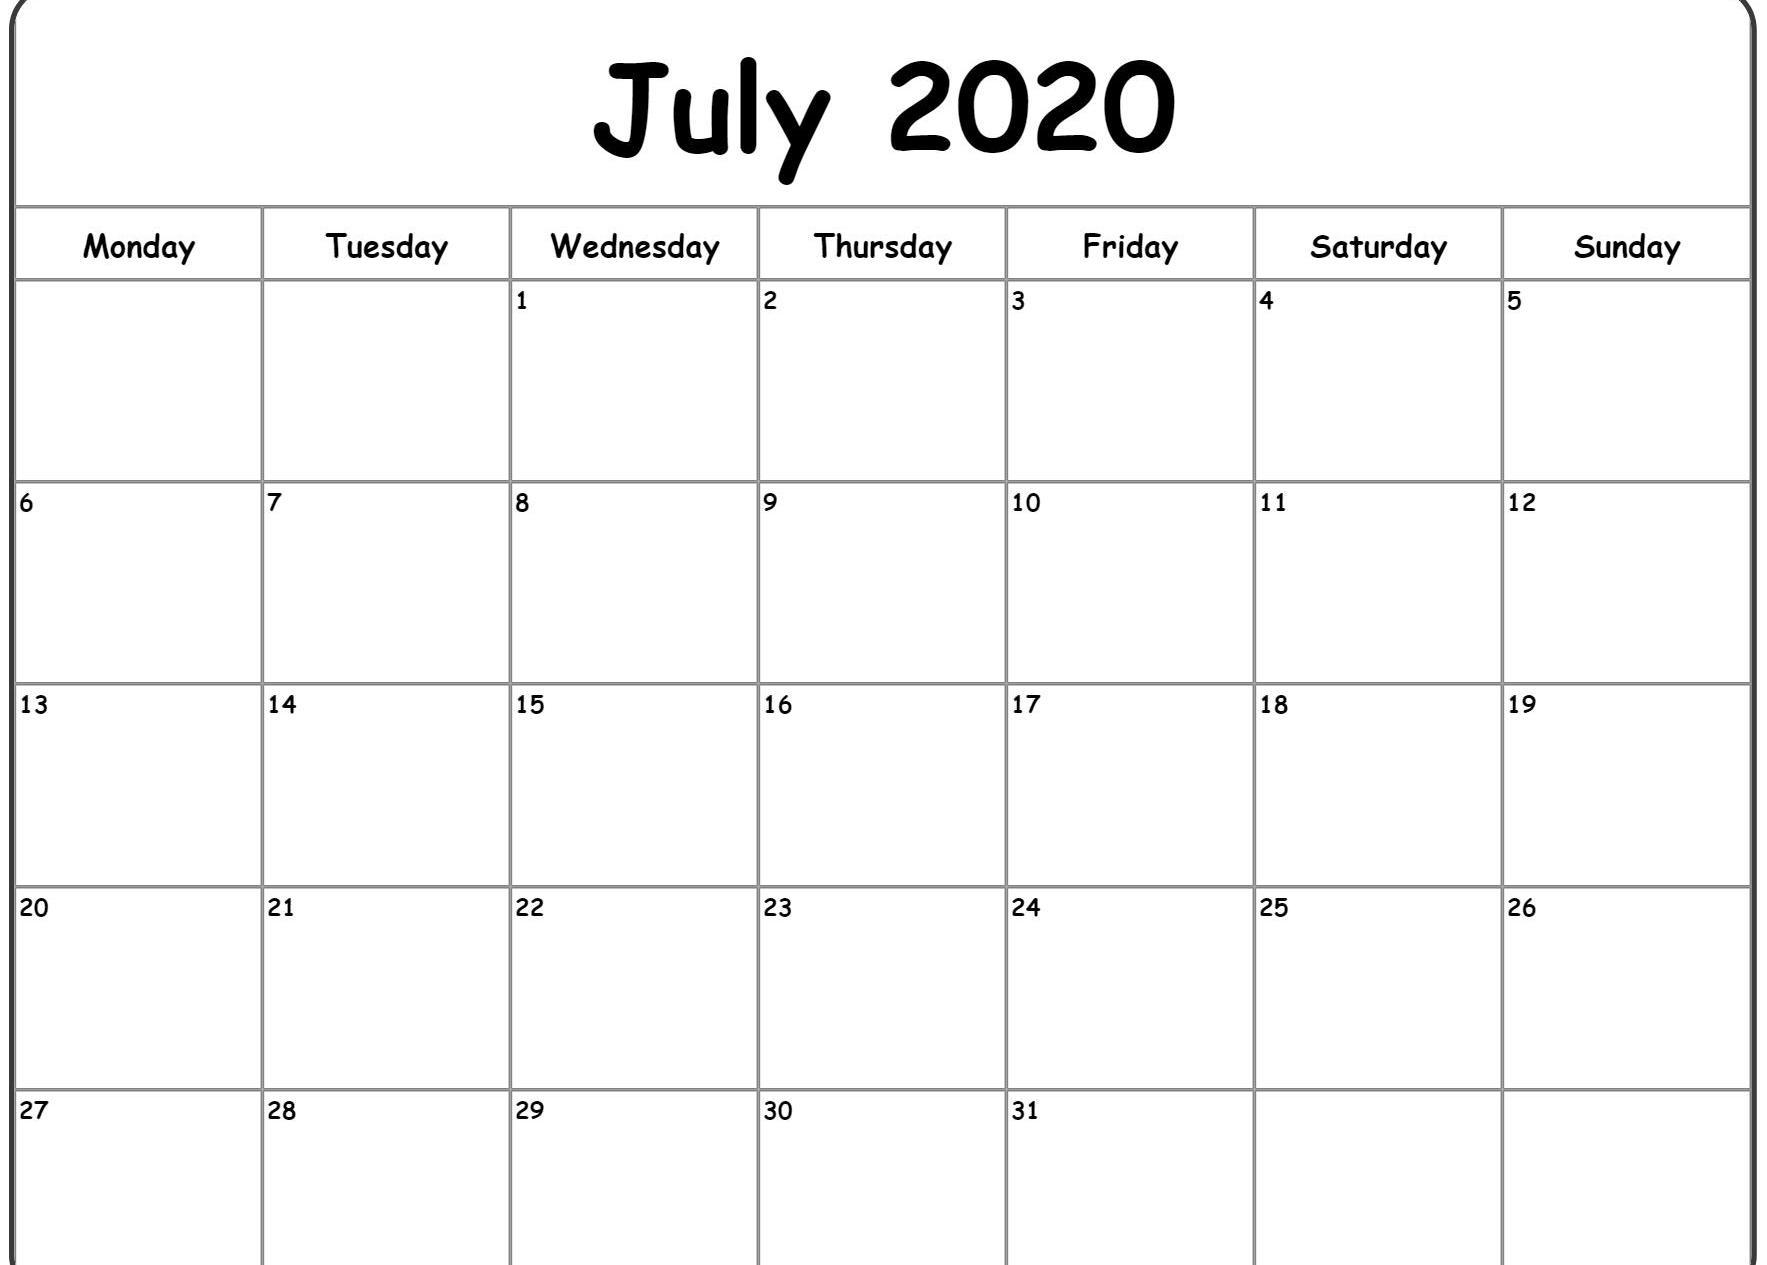 July Calendar 2020 – Printable Template Free Download in Studyblr Calendar 2020